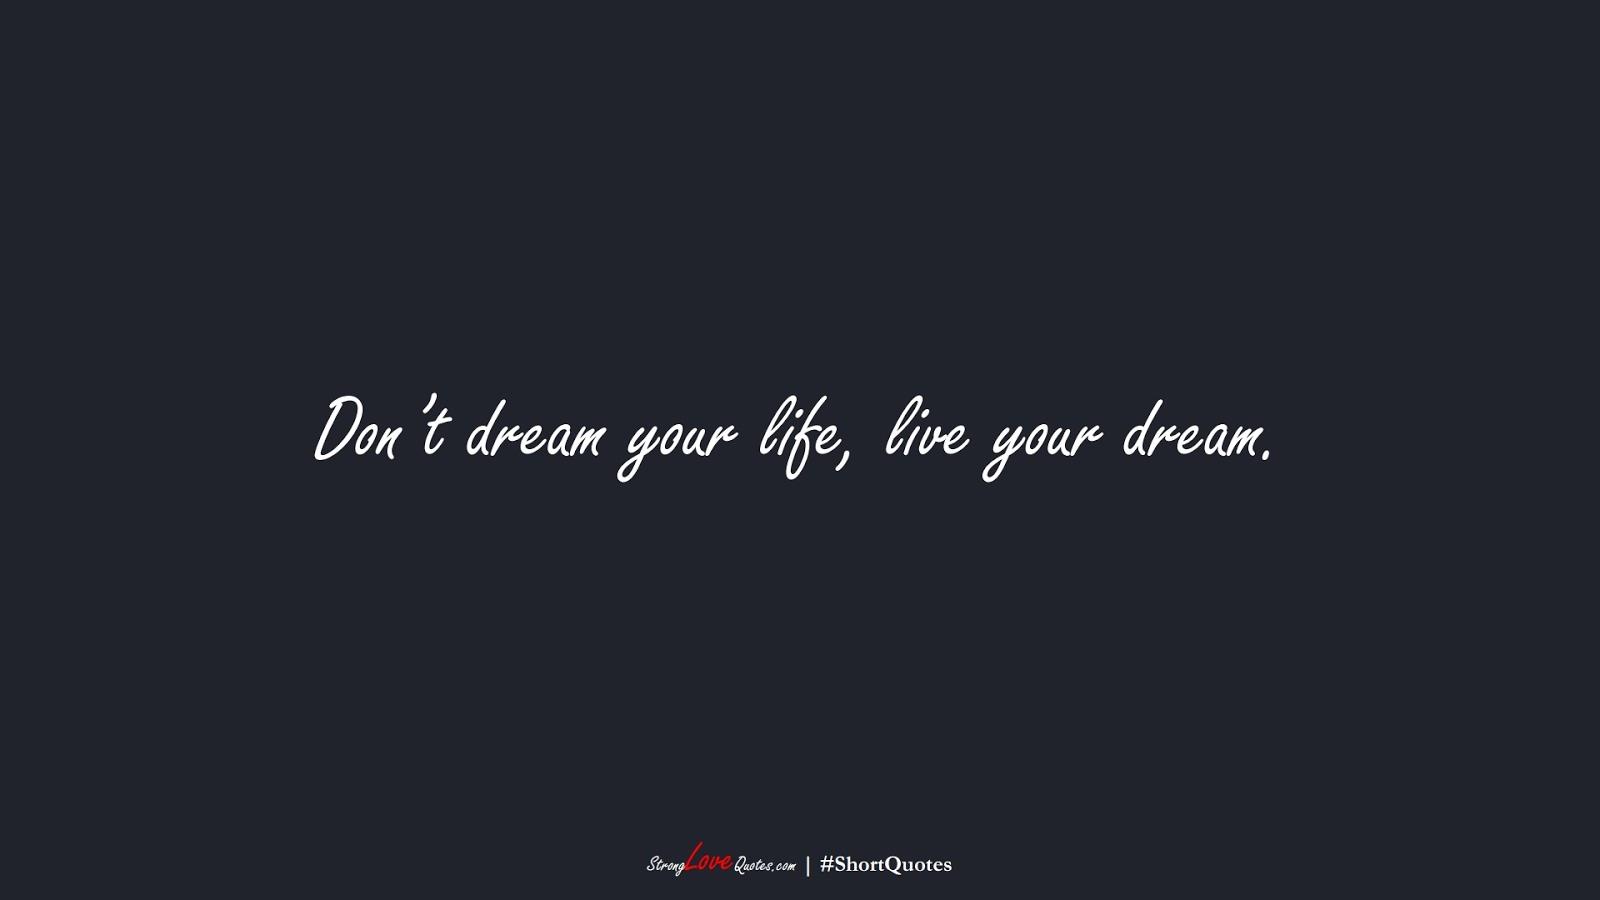 Don't dream your life, live your dream.FALSE